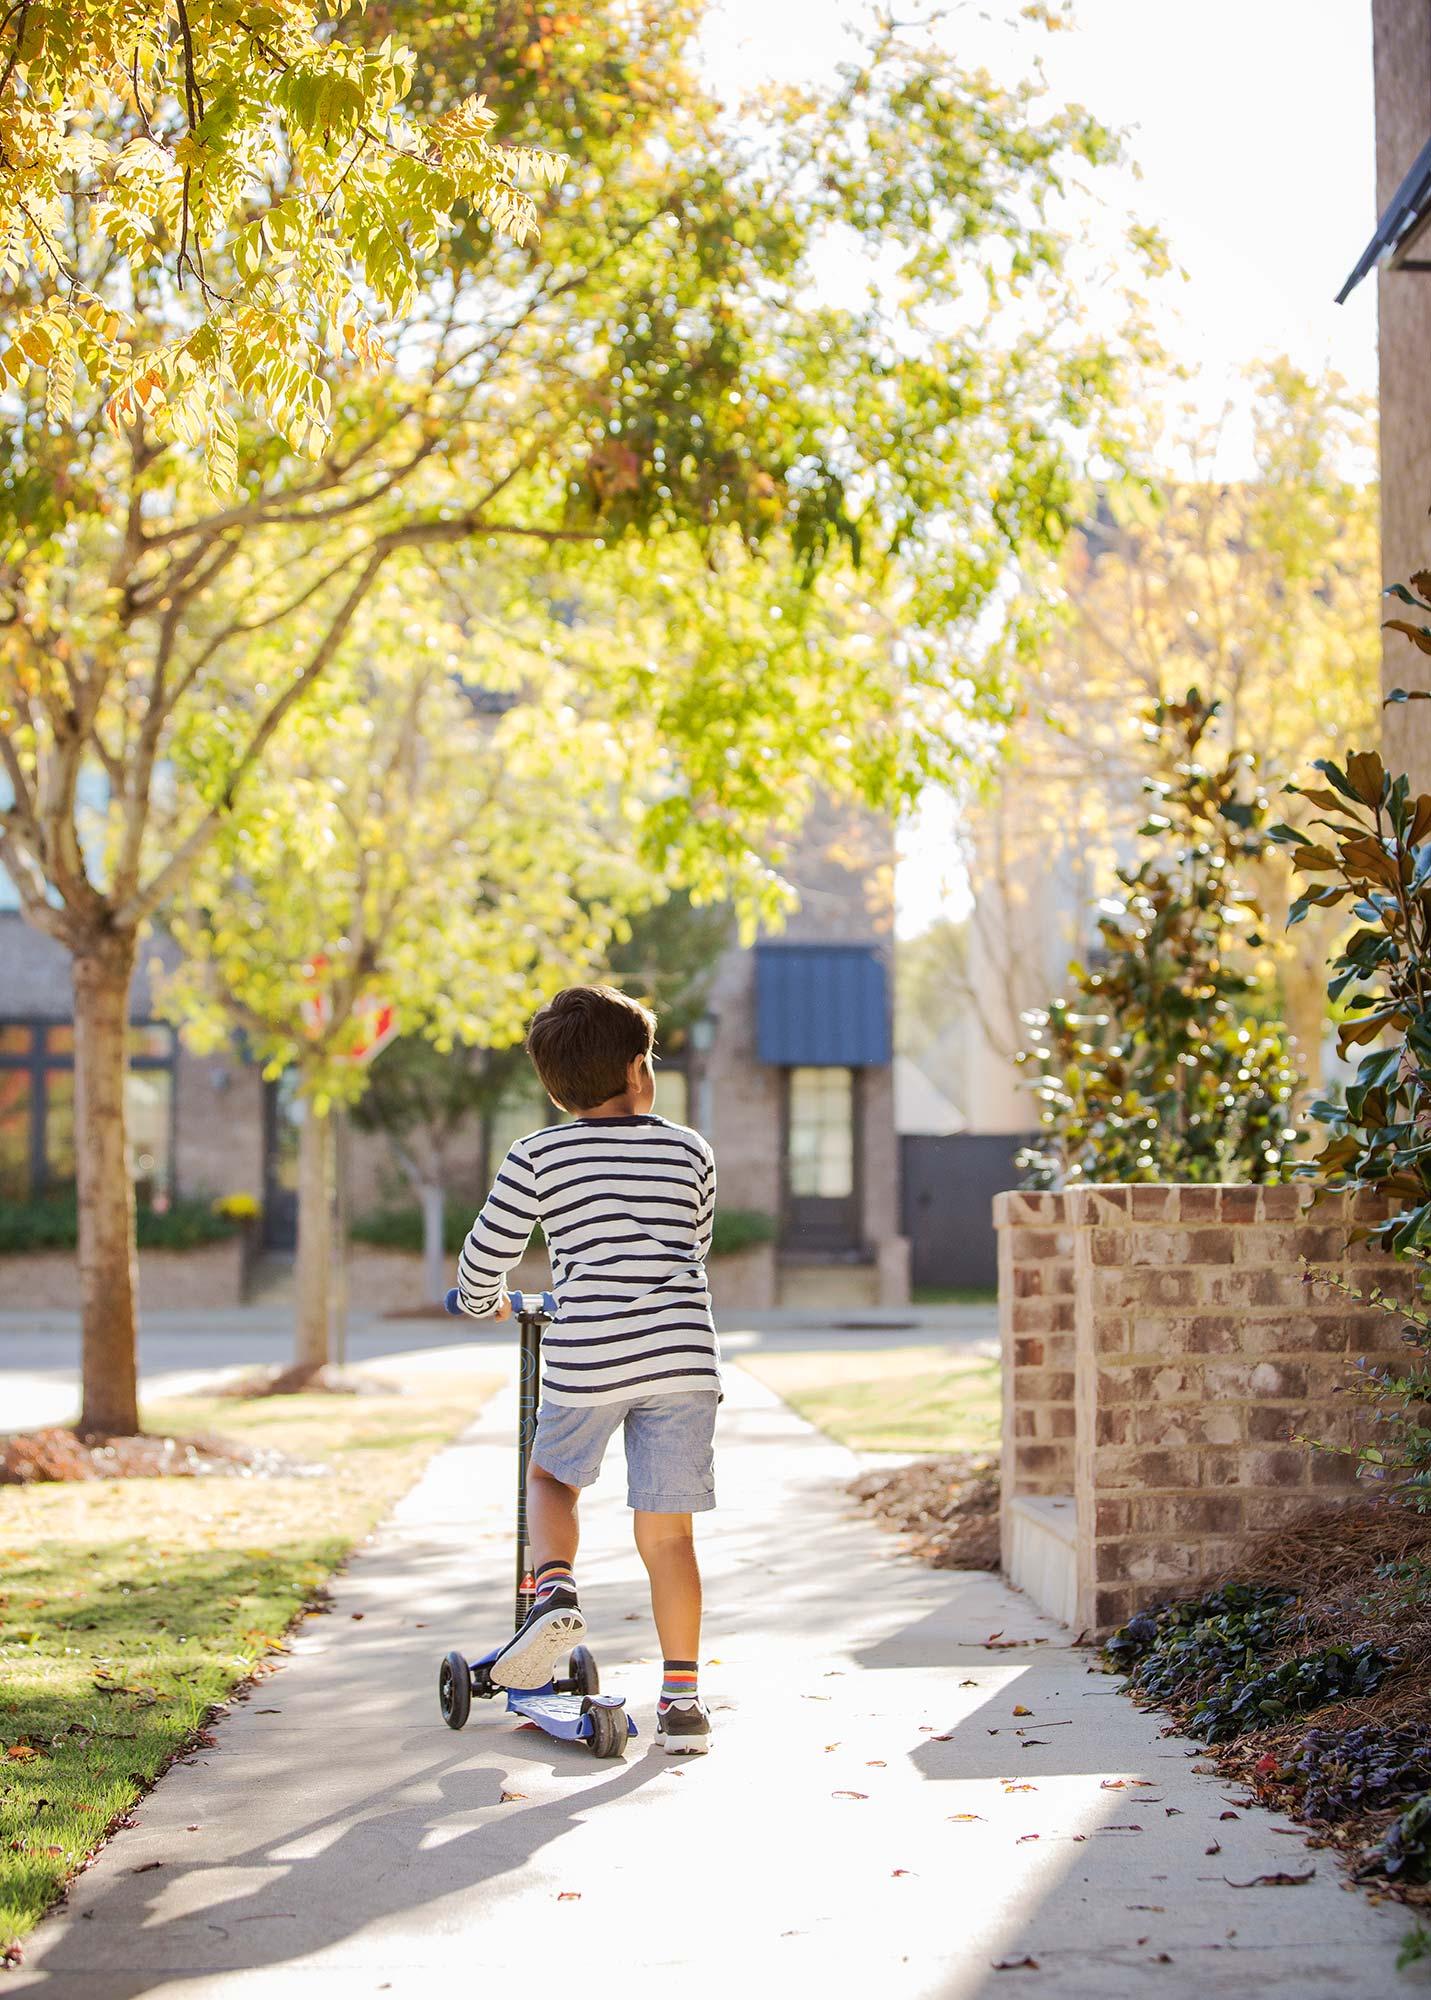 Walkability Sustainability Activity